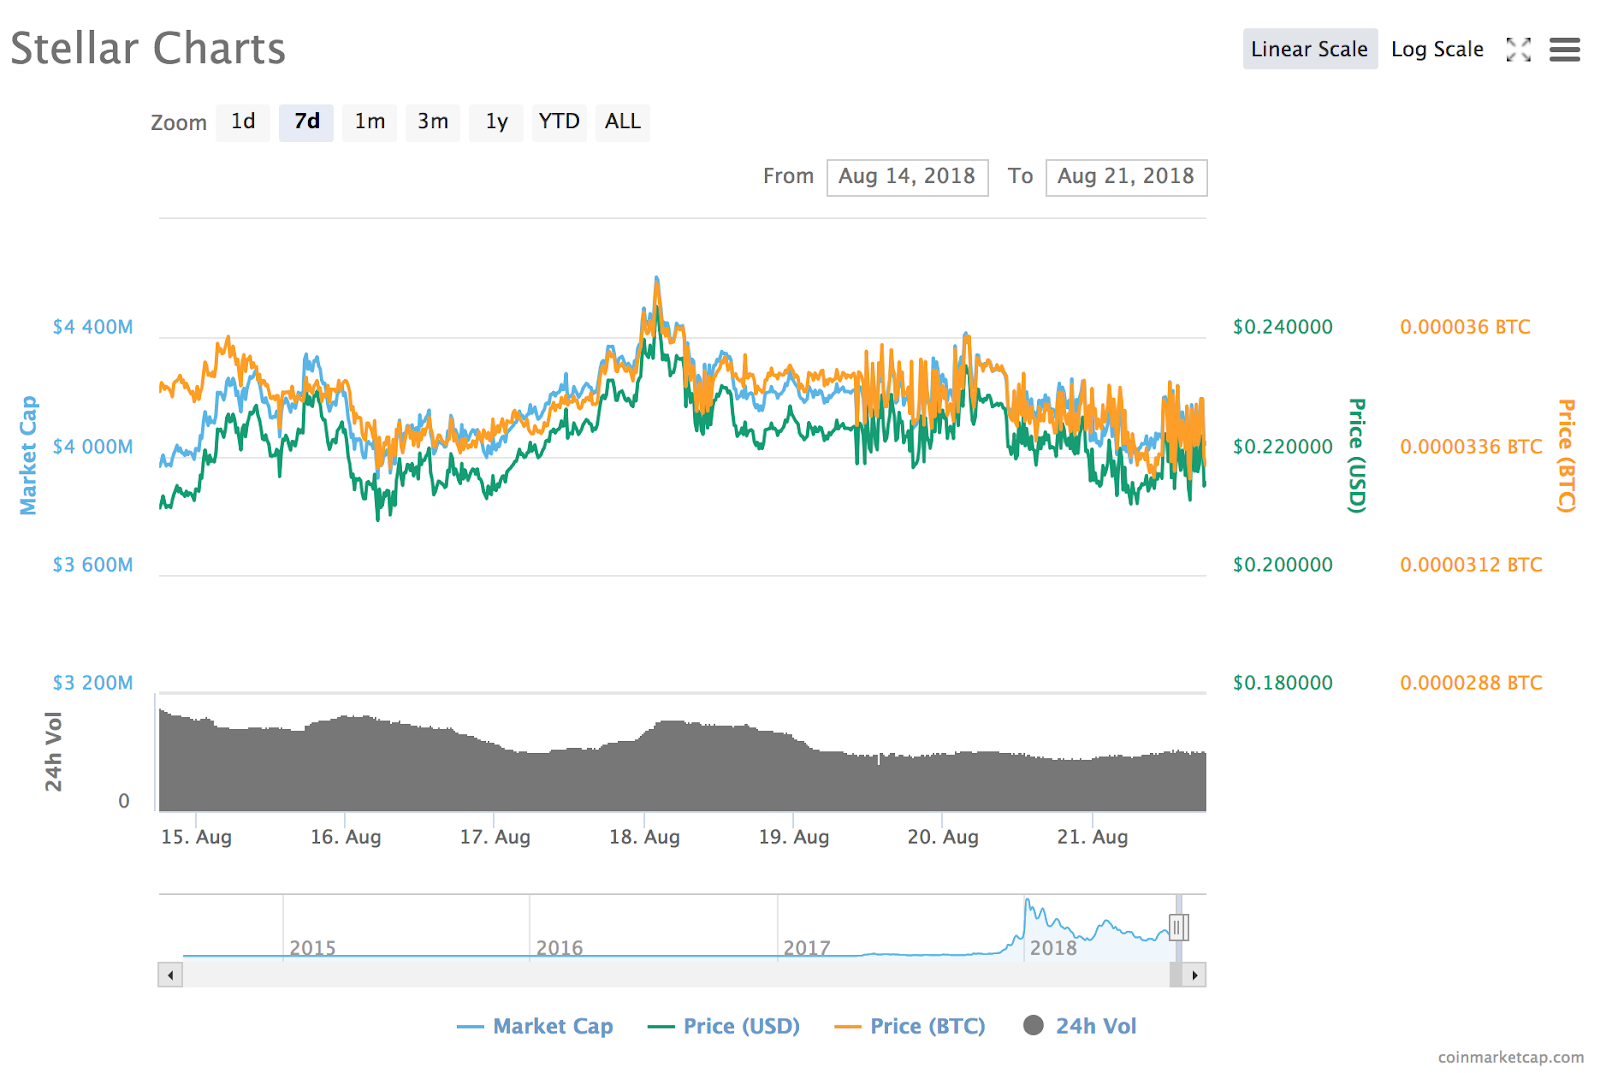 Stellar's 7-day price chart